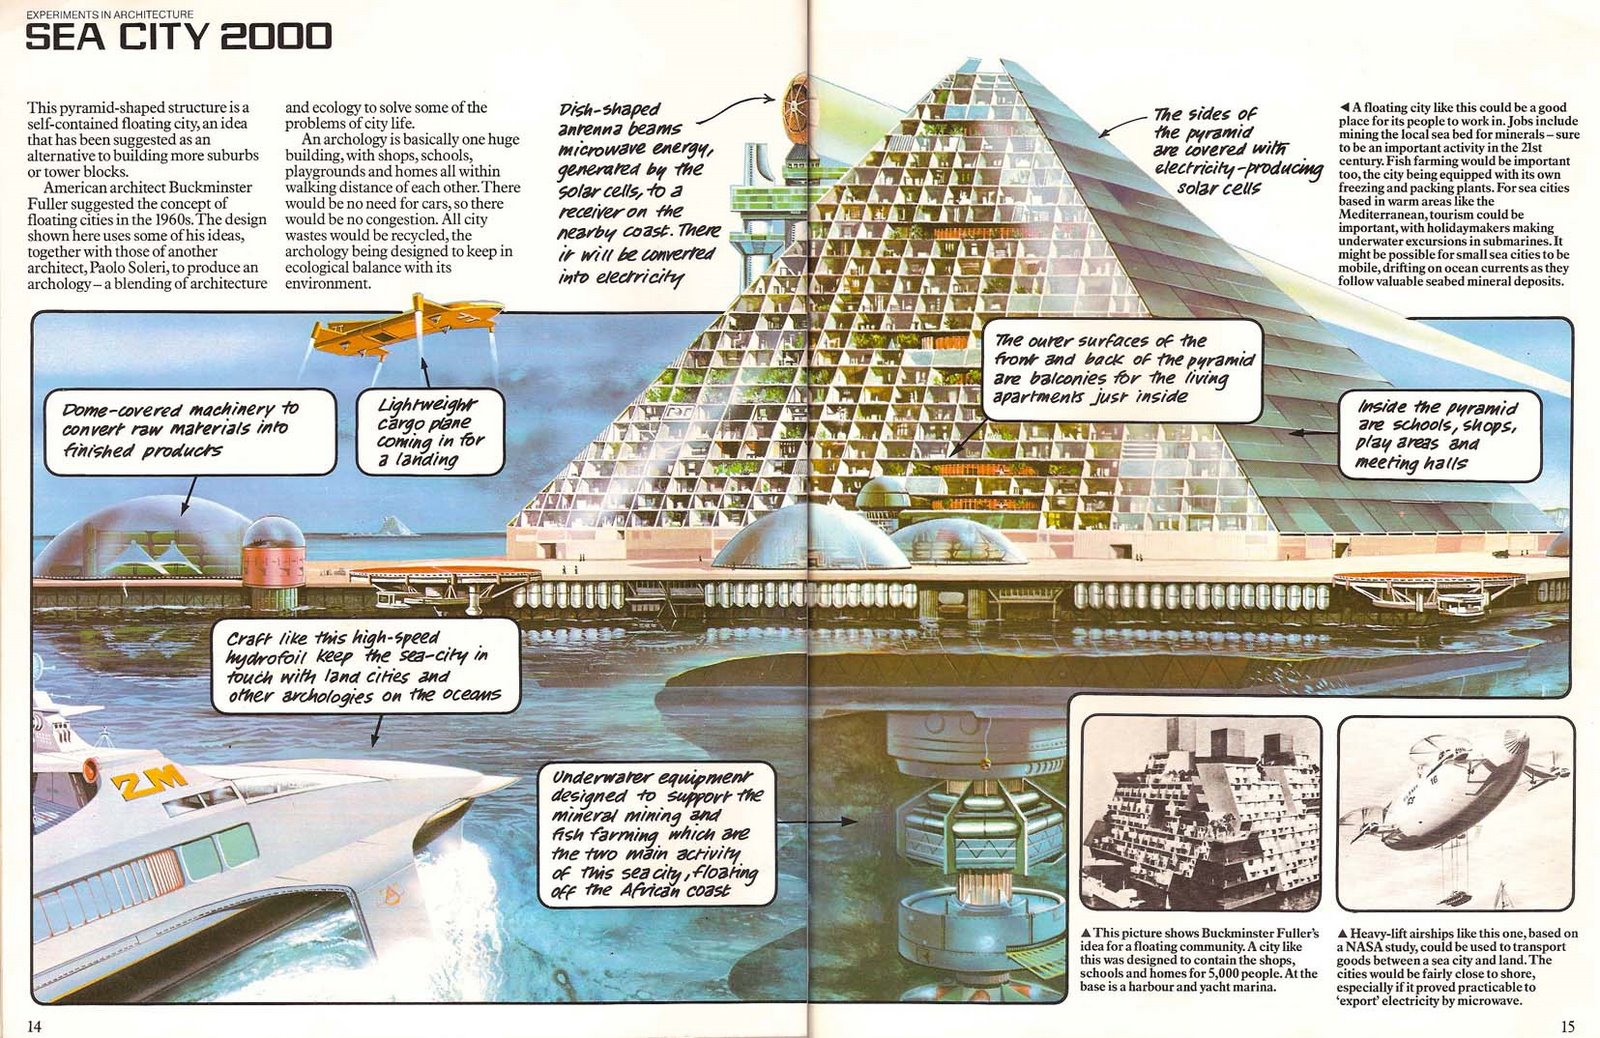 World of Future Sea City 2000 small.jpg